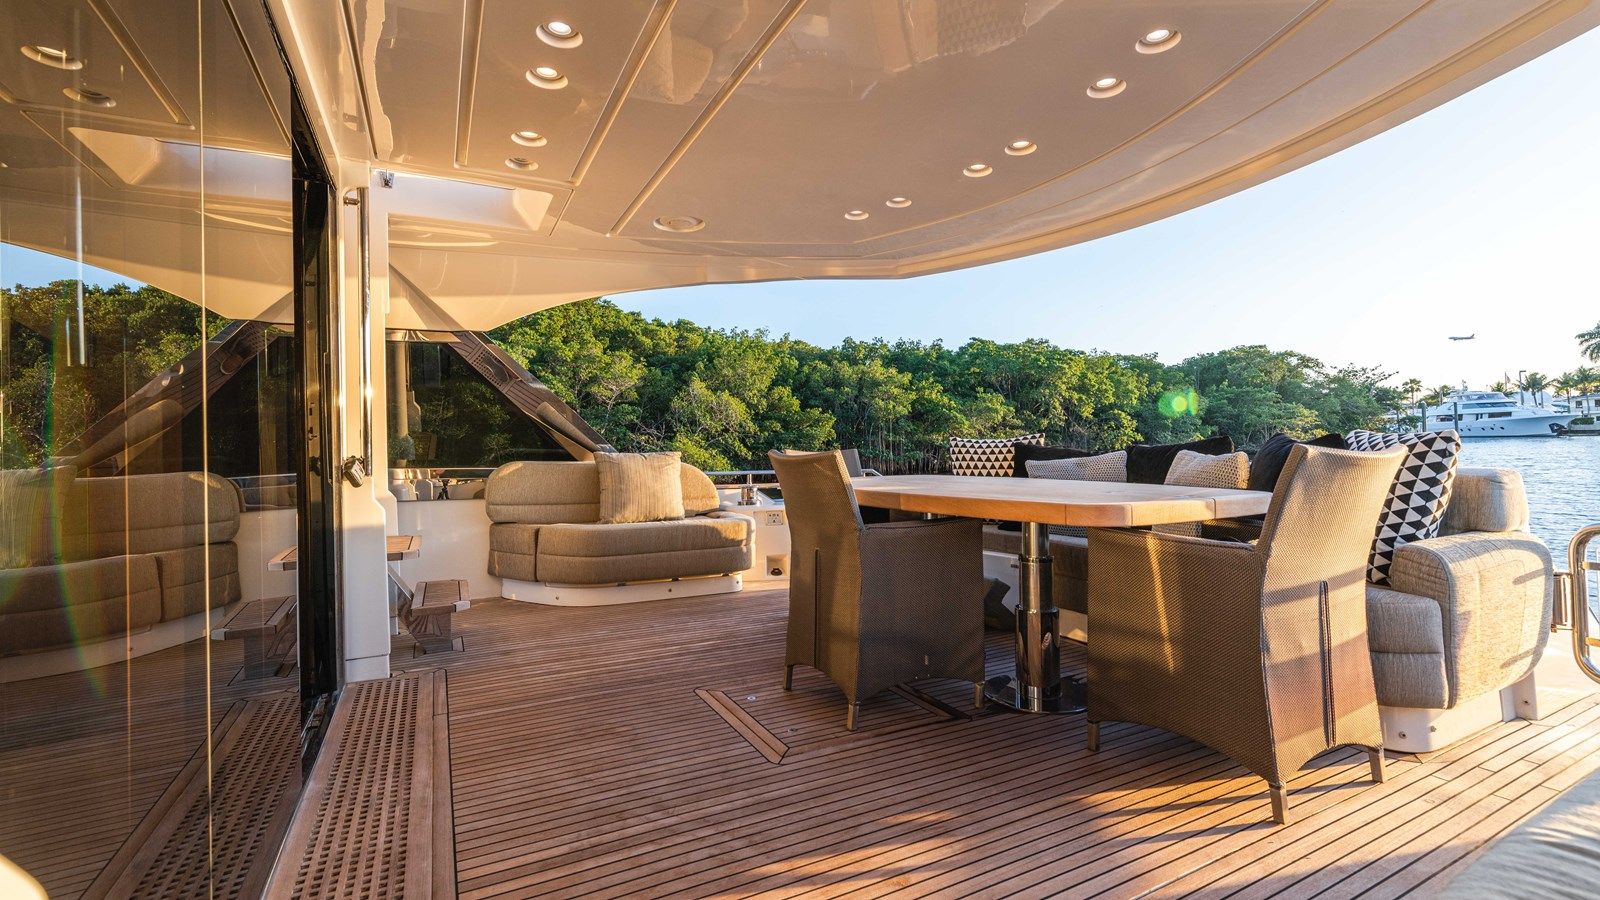 76 Monte Carlo (72 of 127) 2014 MONTE CARLO YACHTS Motoryacht Motor Yacht 2825062